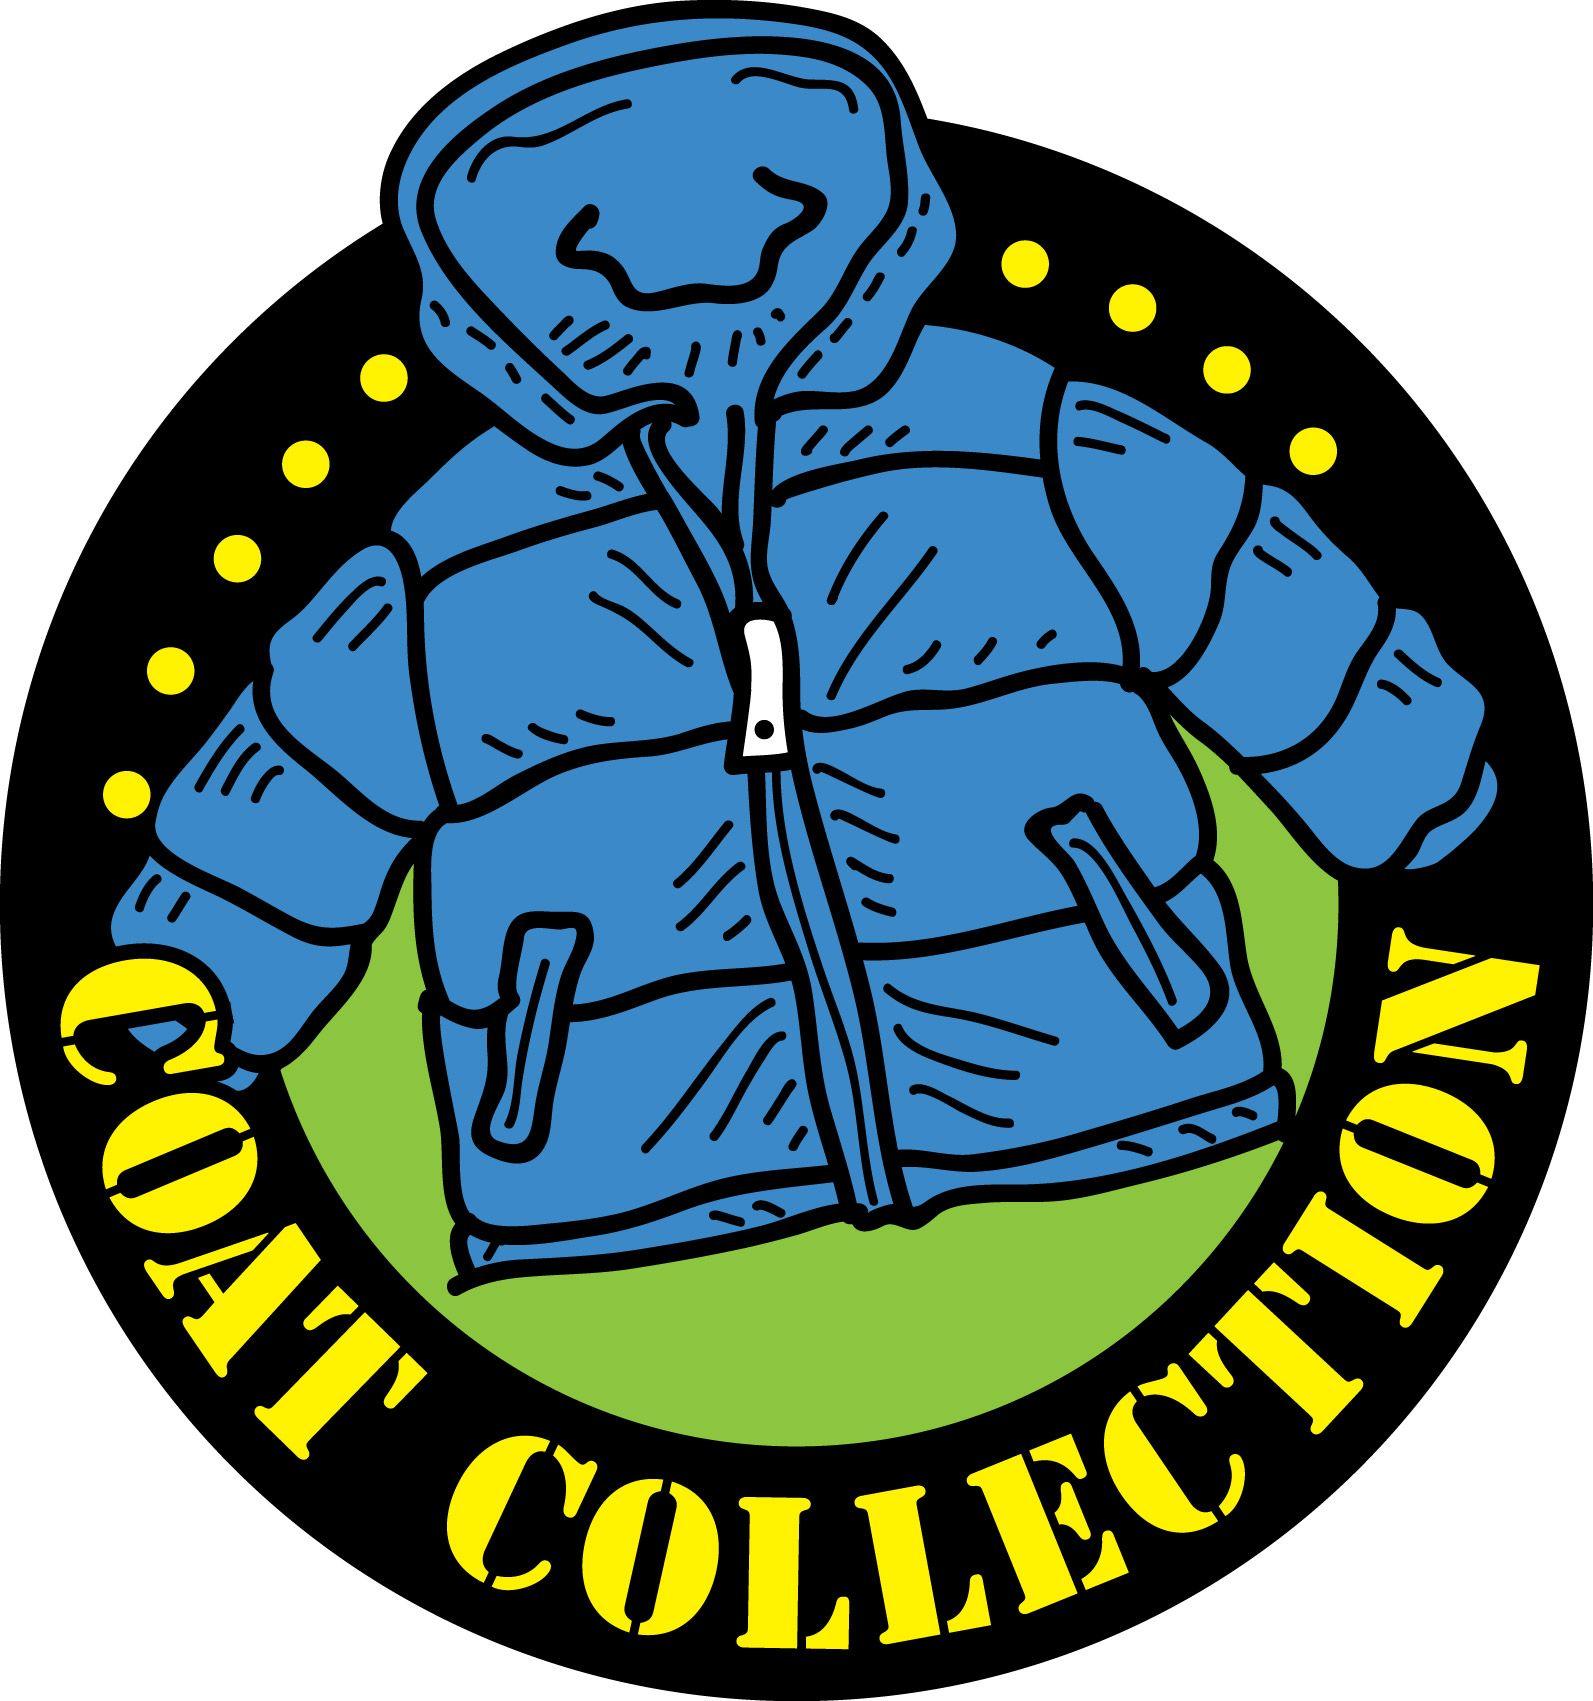 1593x1701 Fall Clothing Drive Clip Art Help Seneca Street Veterans